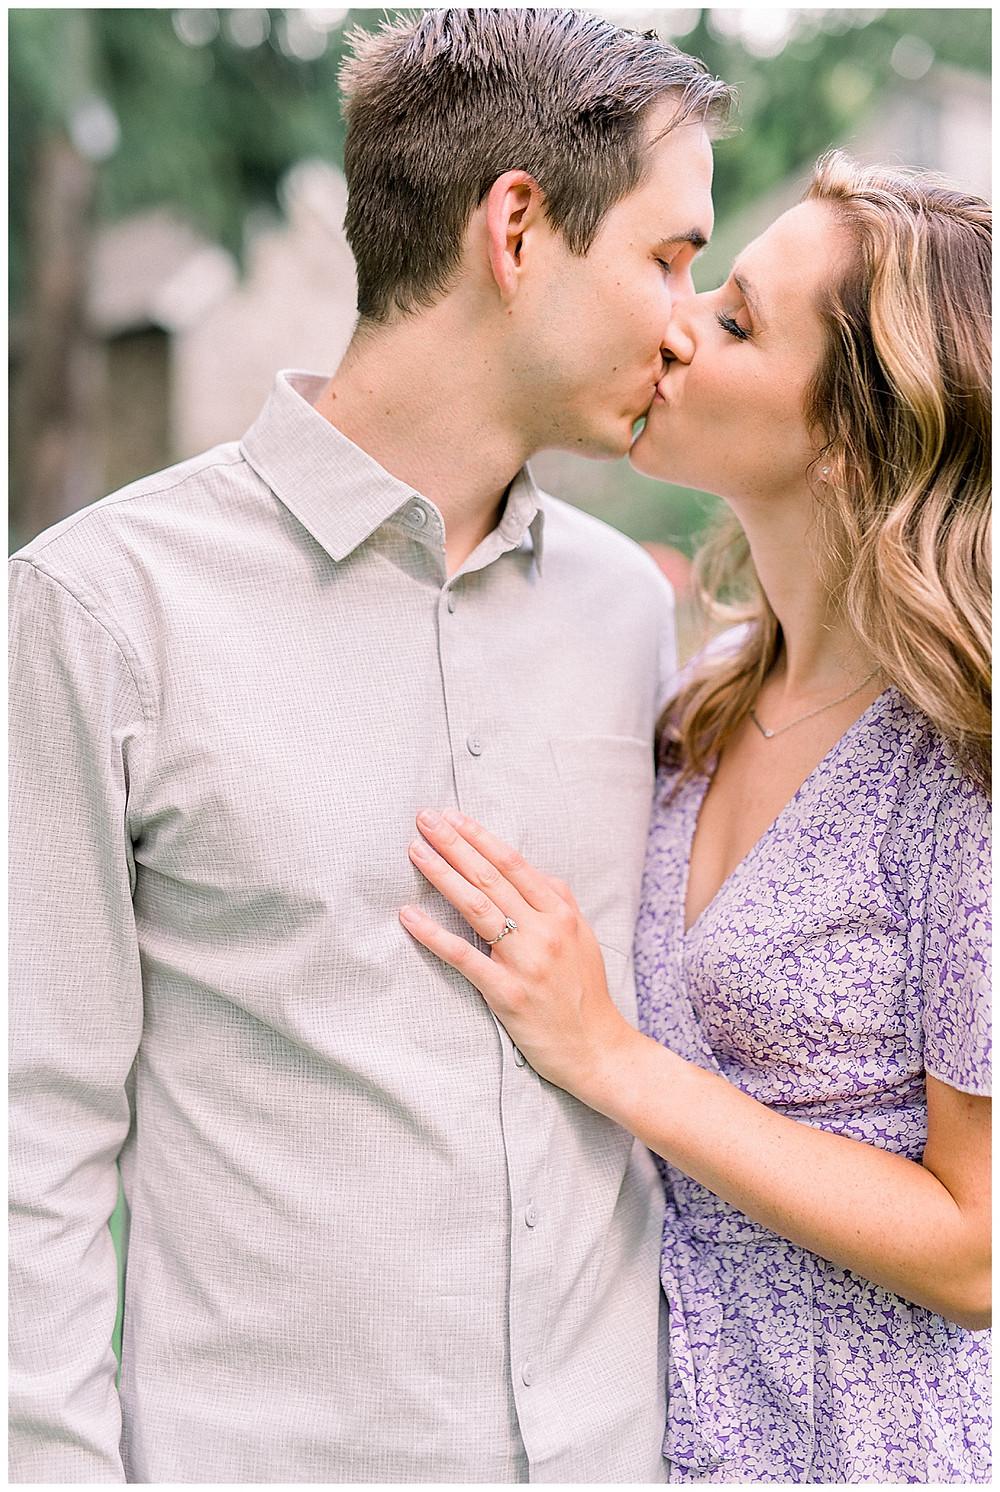 An engaged couple kissing at Historic Shady Lane